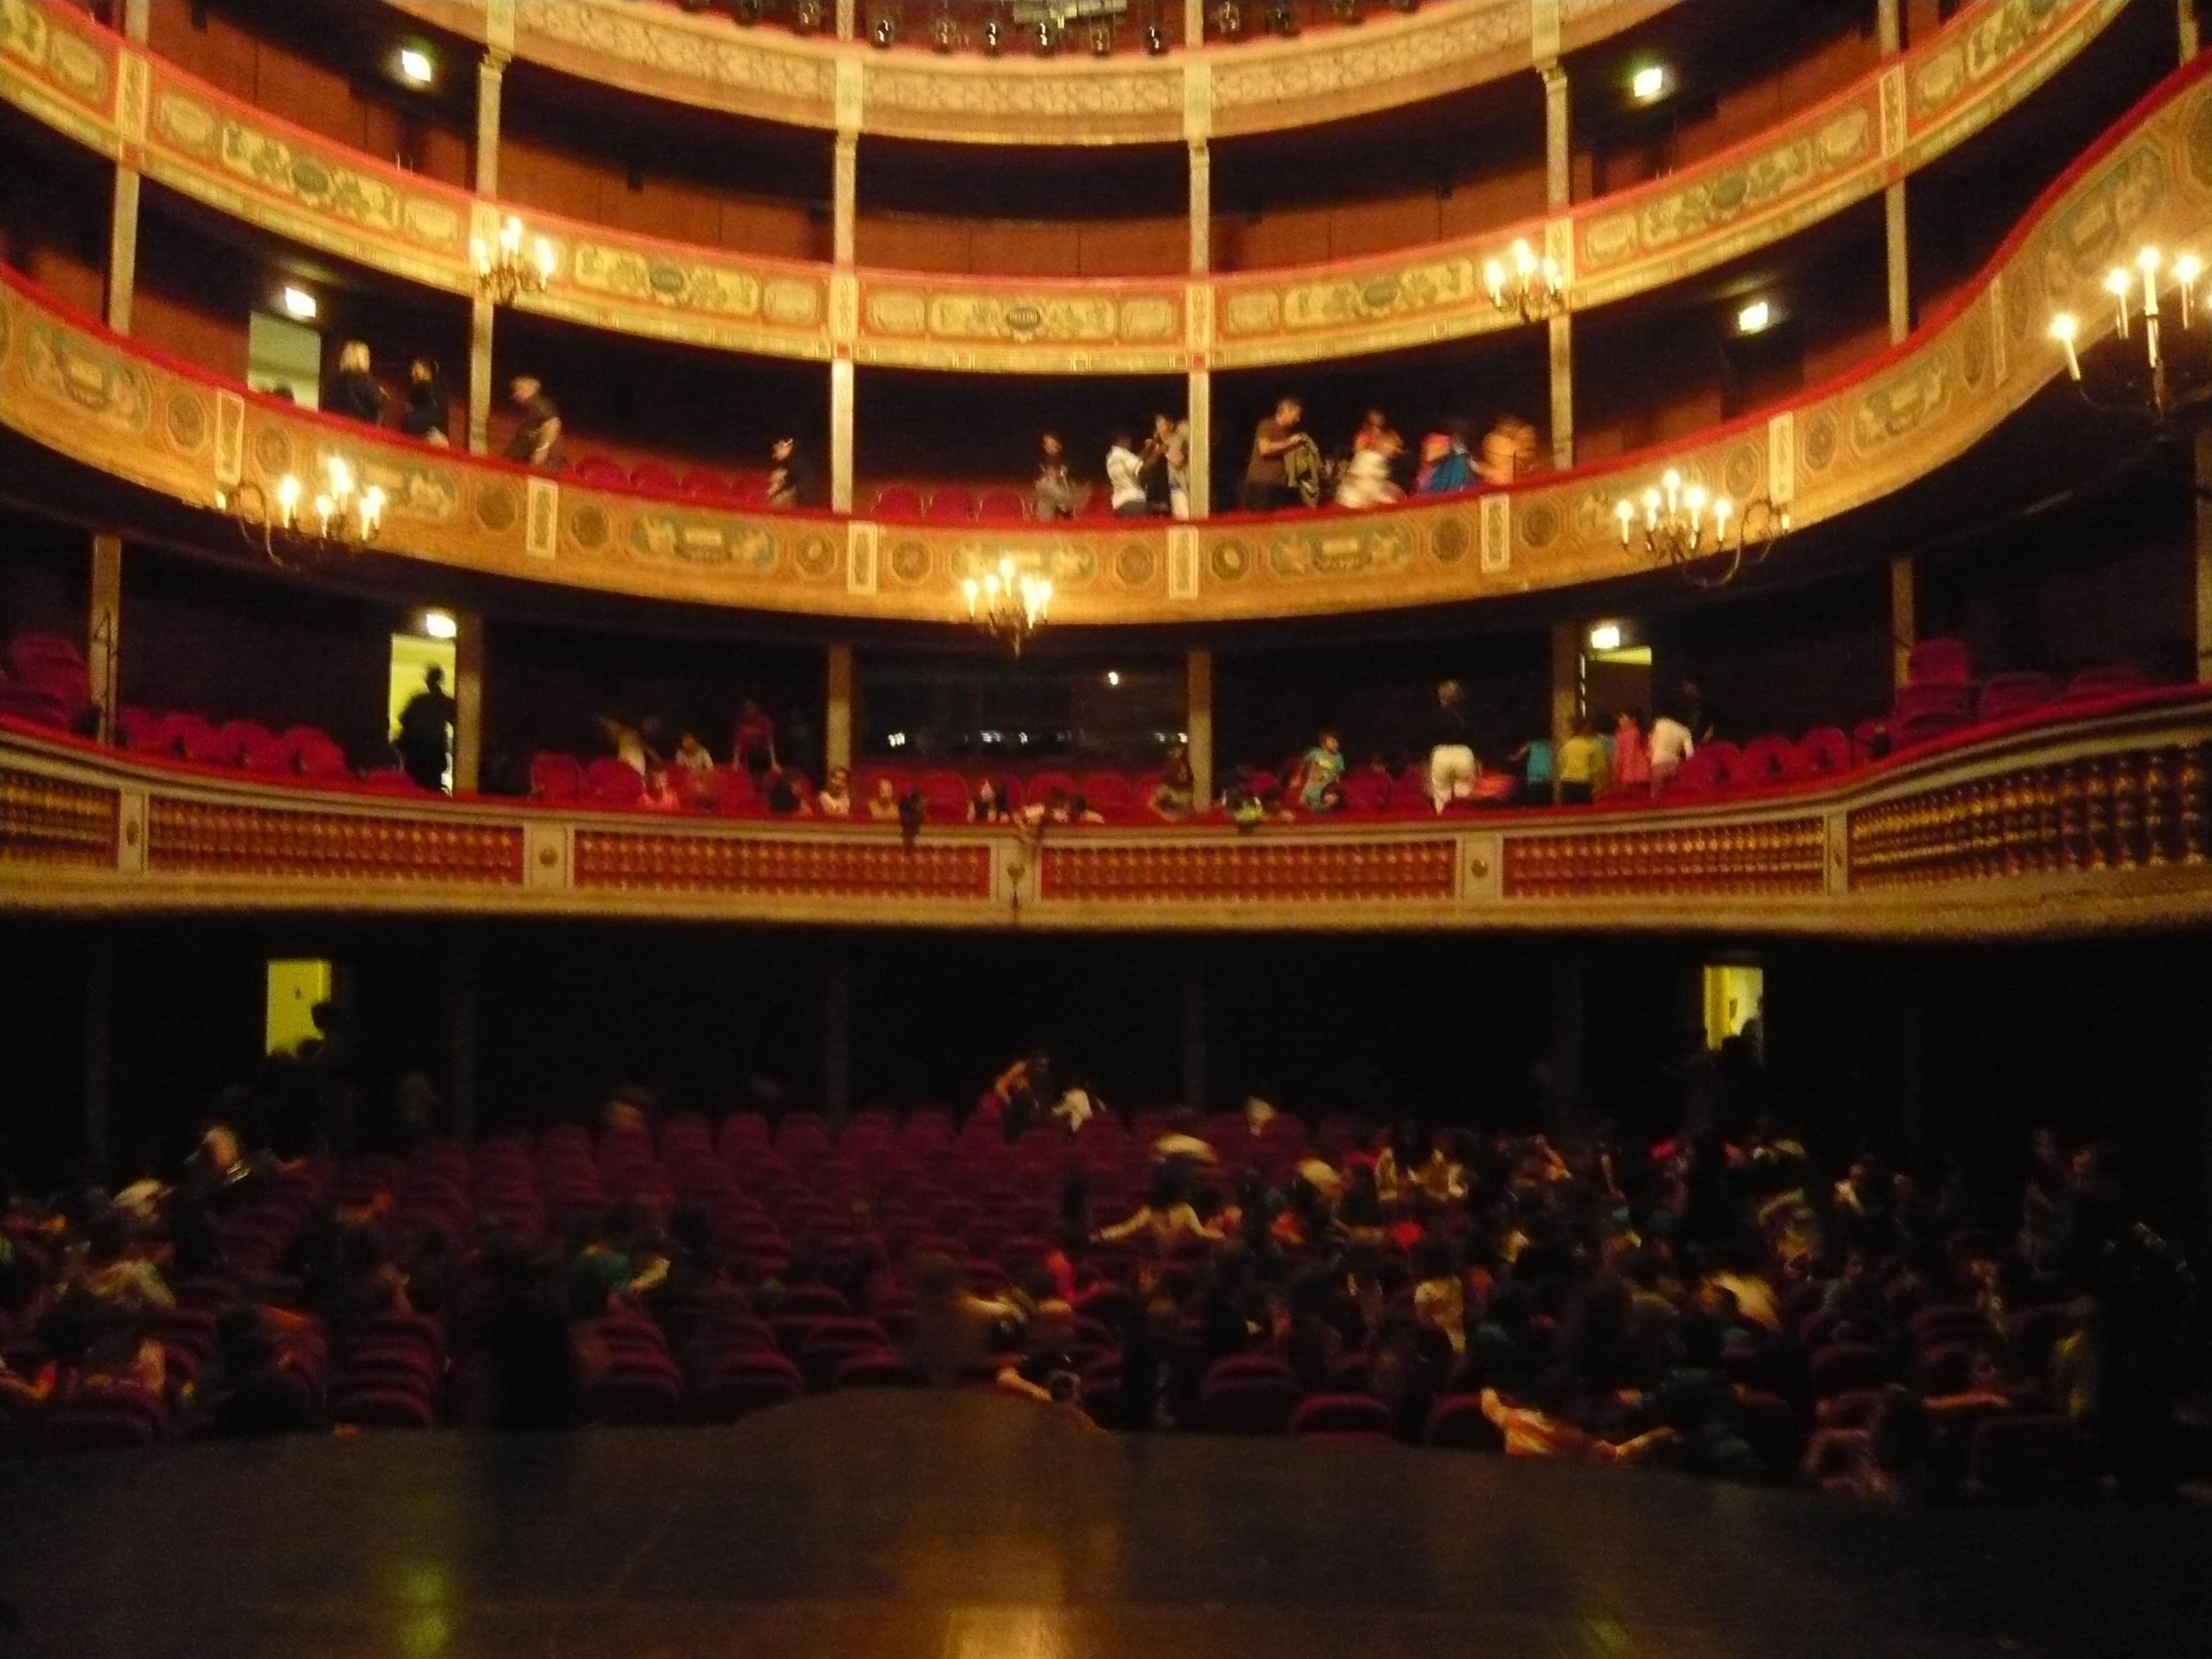 Aurelie_Verioca_ANDANDO_JMF_Théâtre_Municipal_de_Beziers_14_10_14